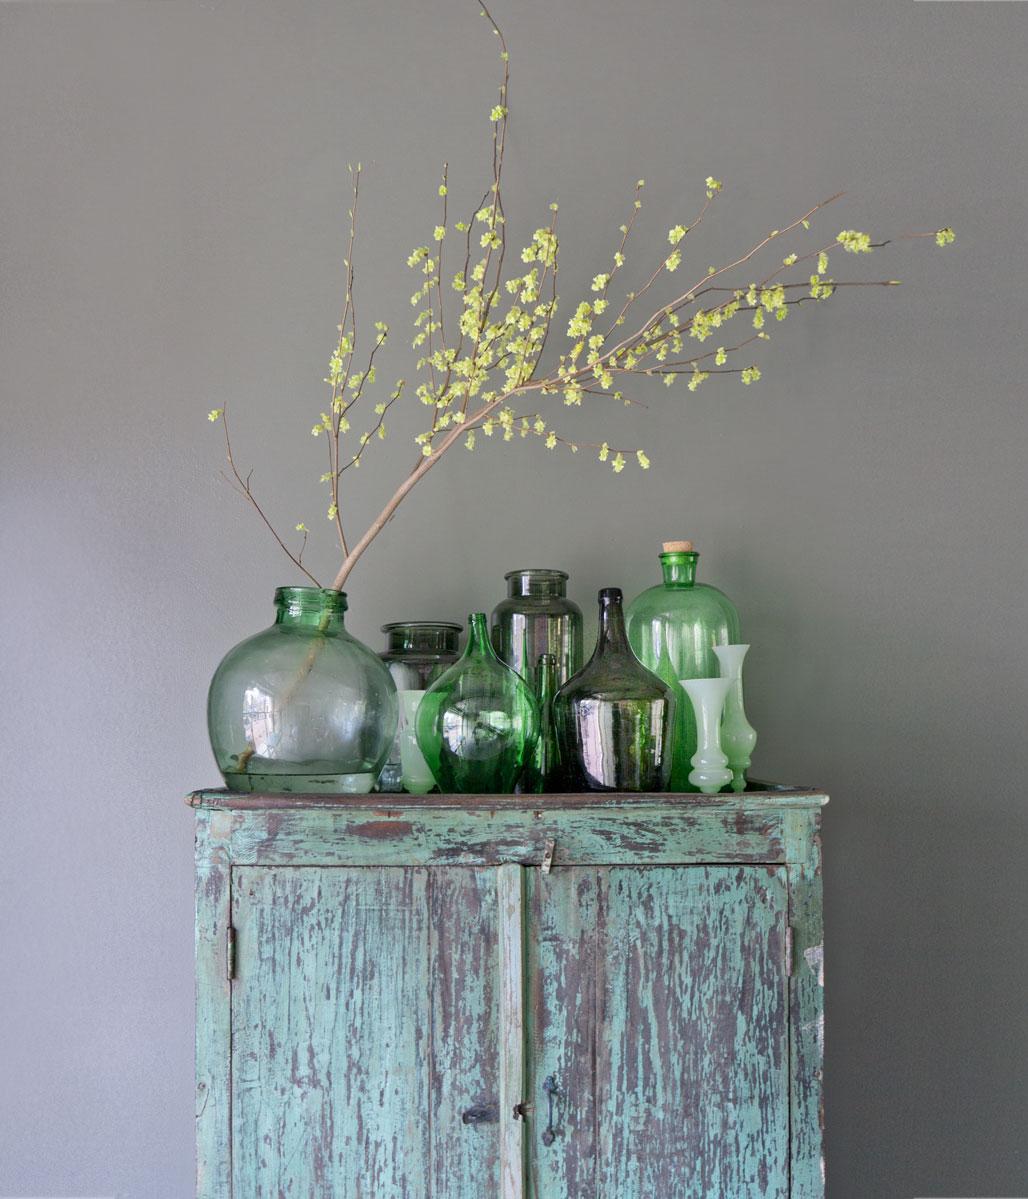 groene vazen